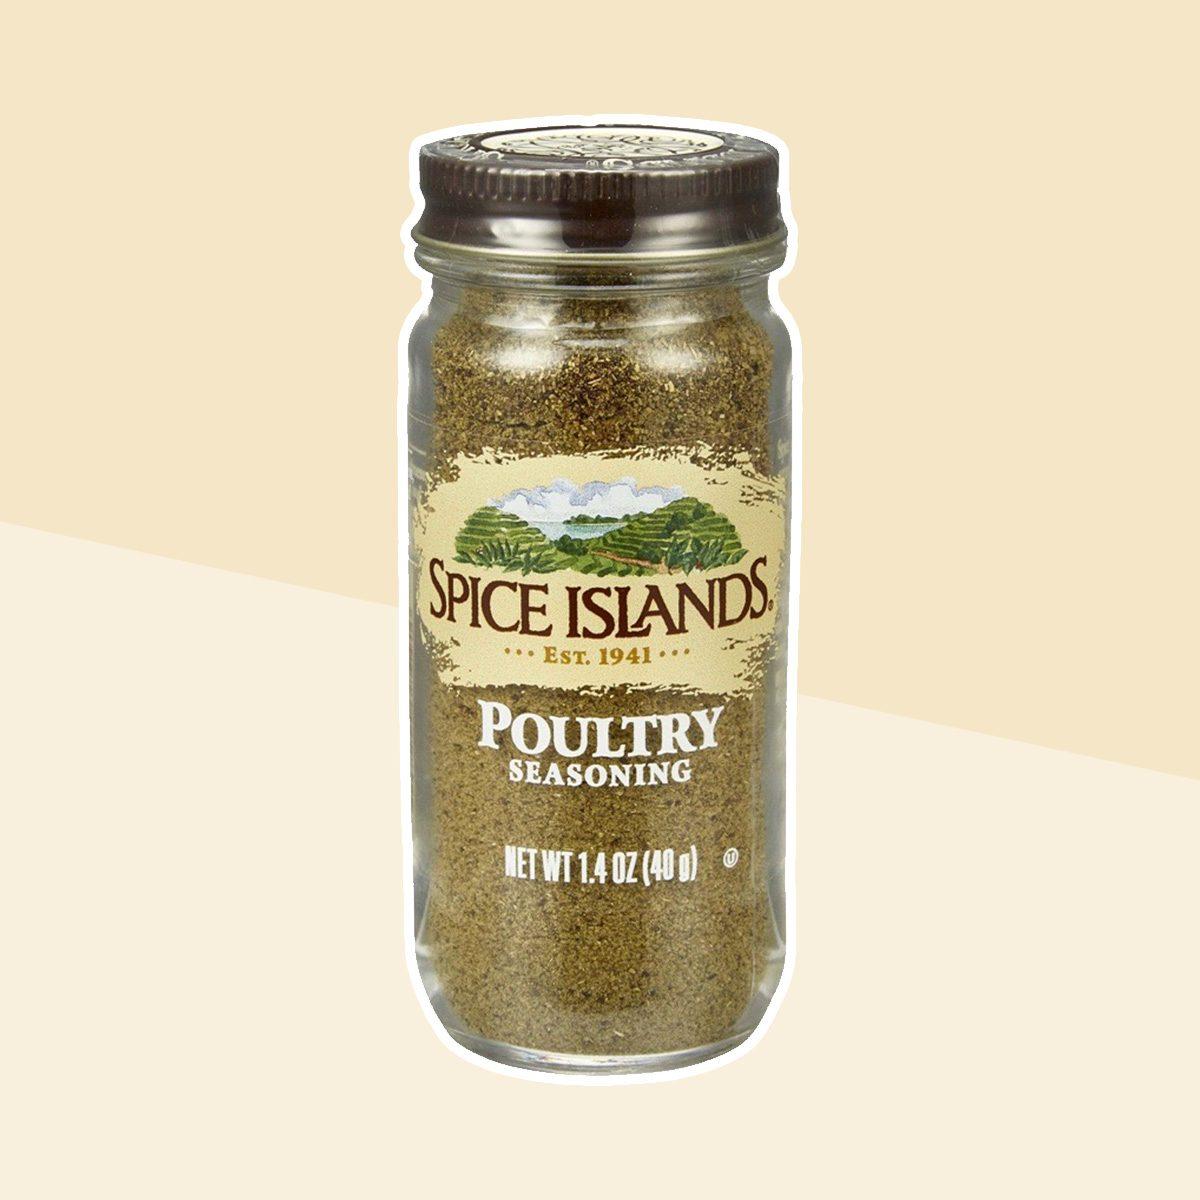 Spice Islands Gourmet Blends Poultry Seasoning 1.4 oz